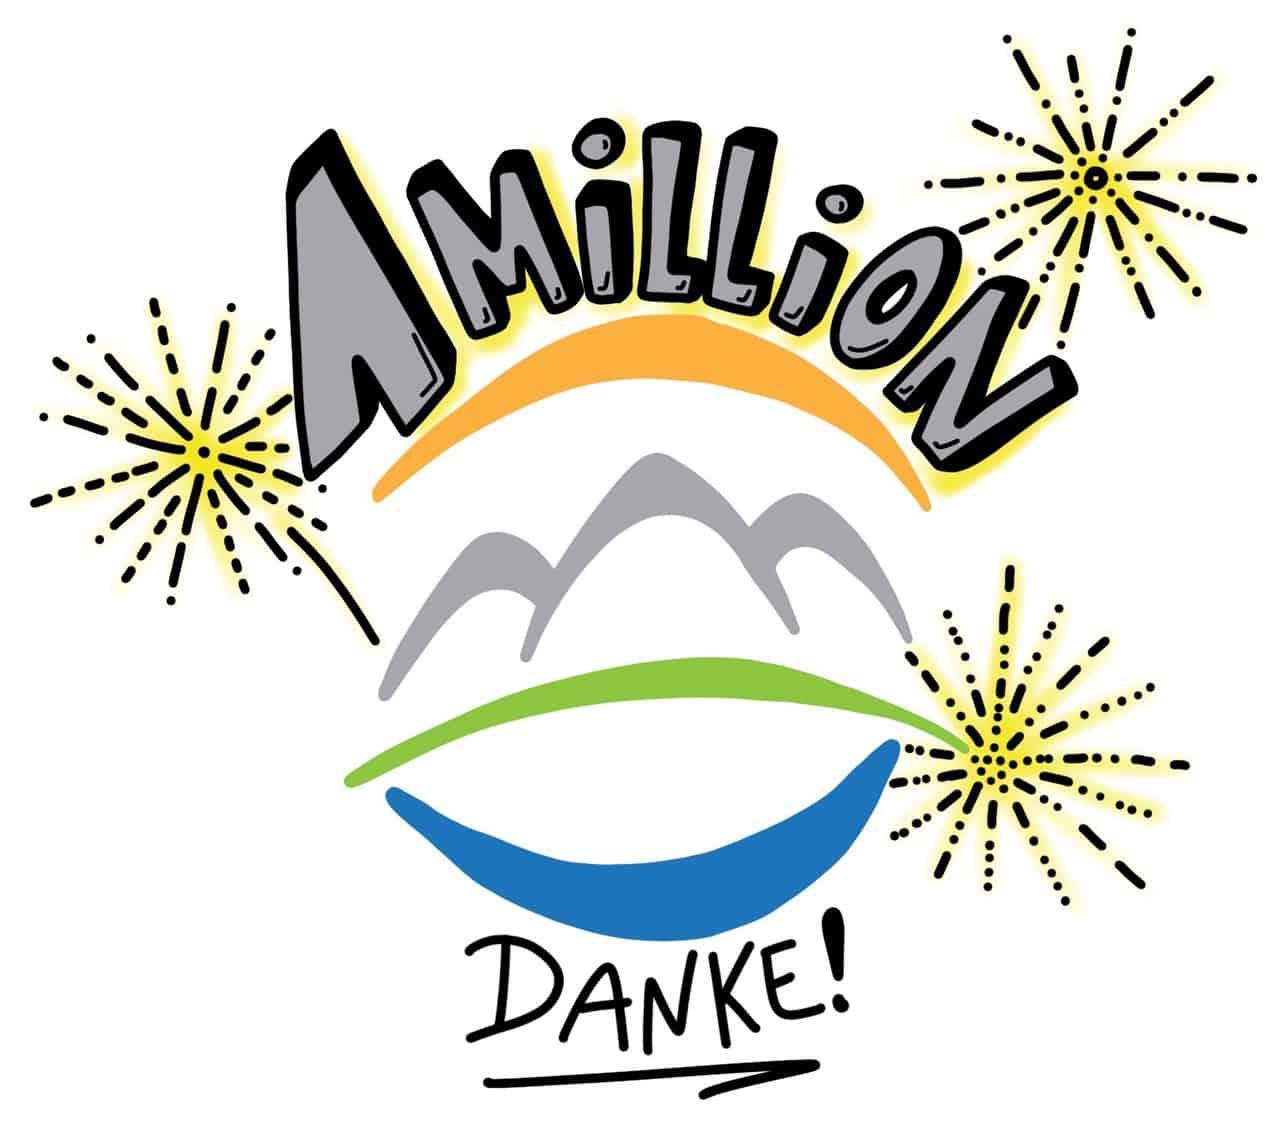 camper-help-1-Millionen-Danke